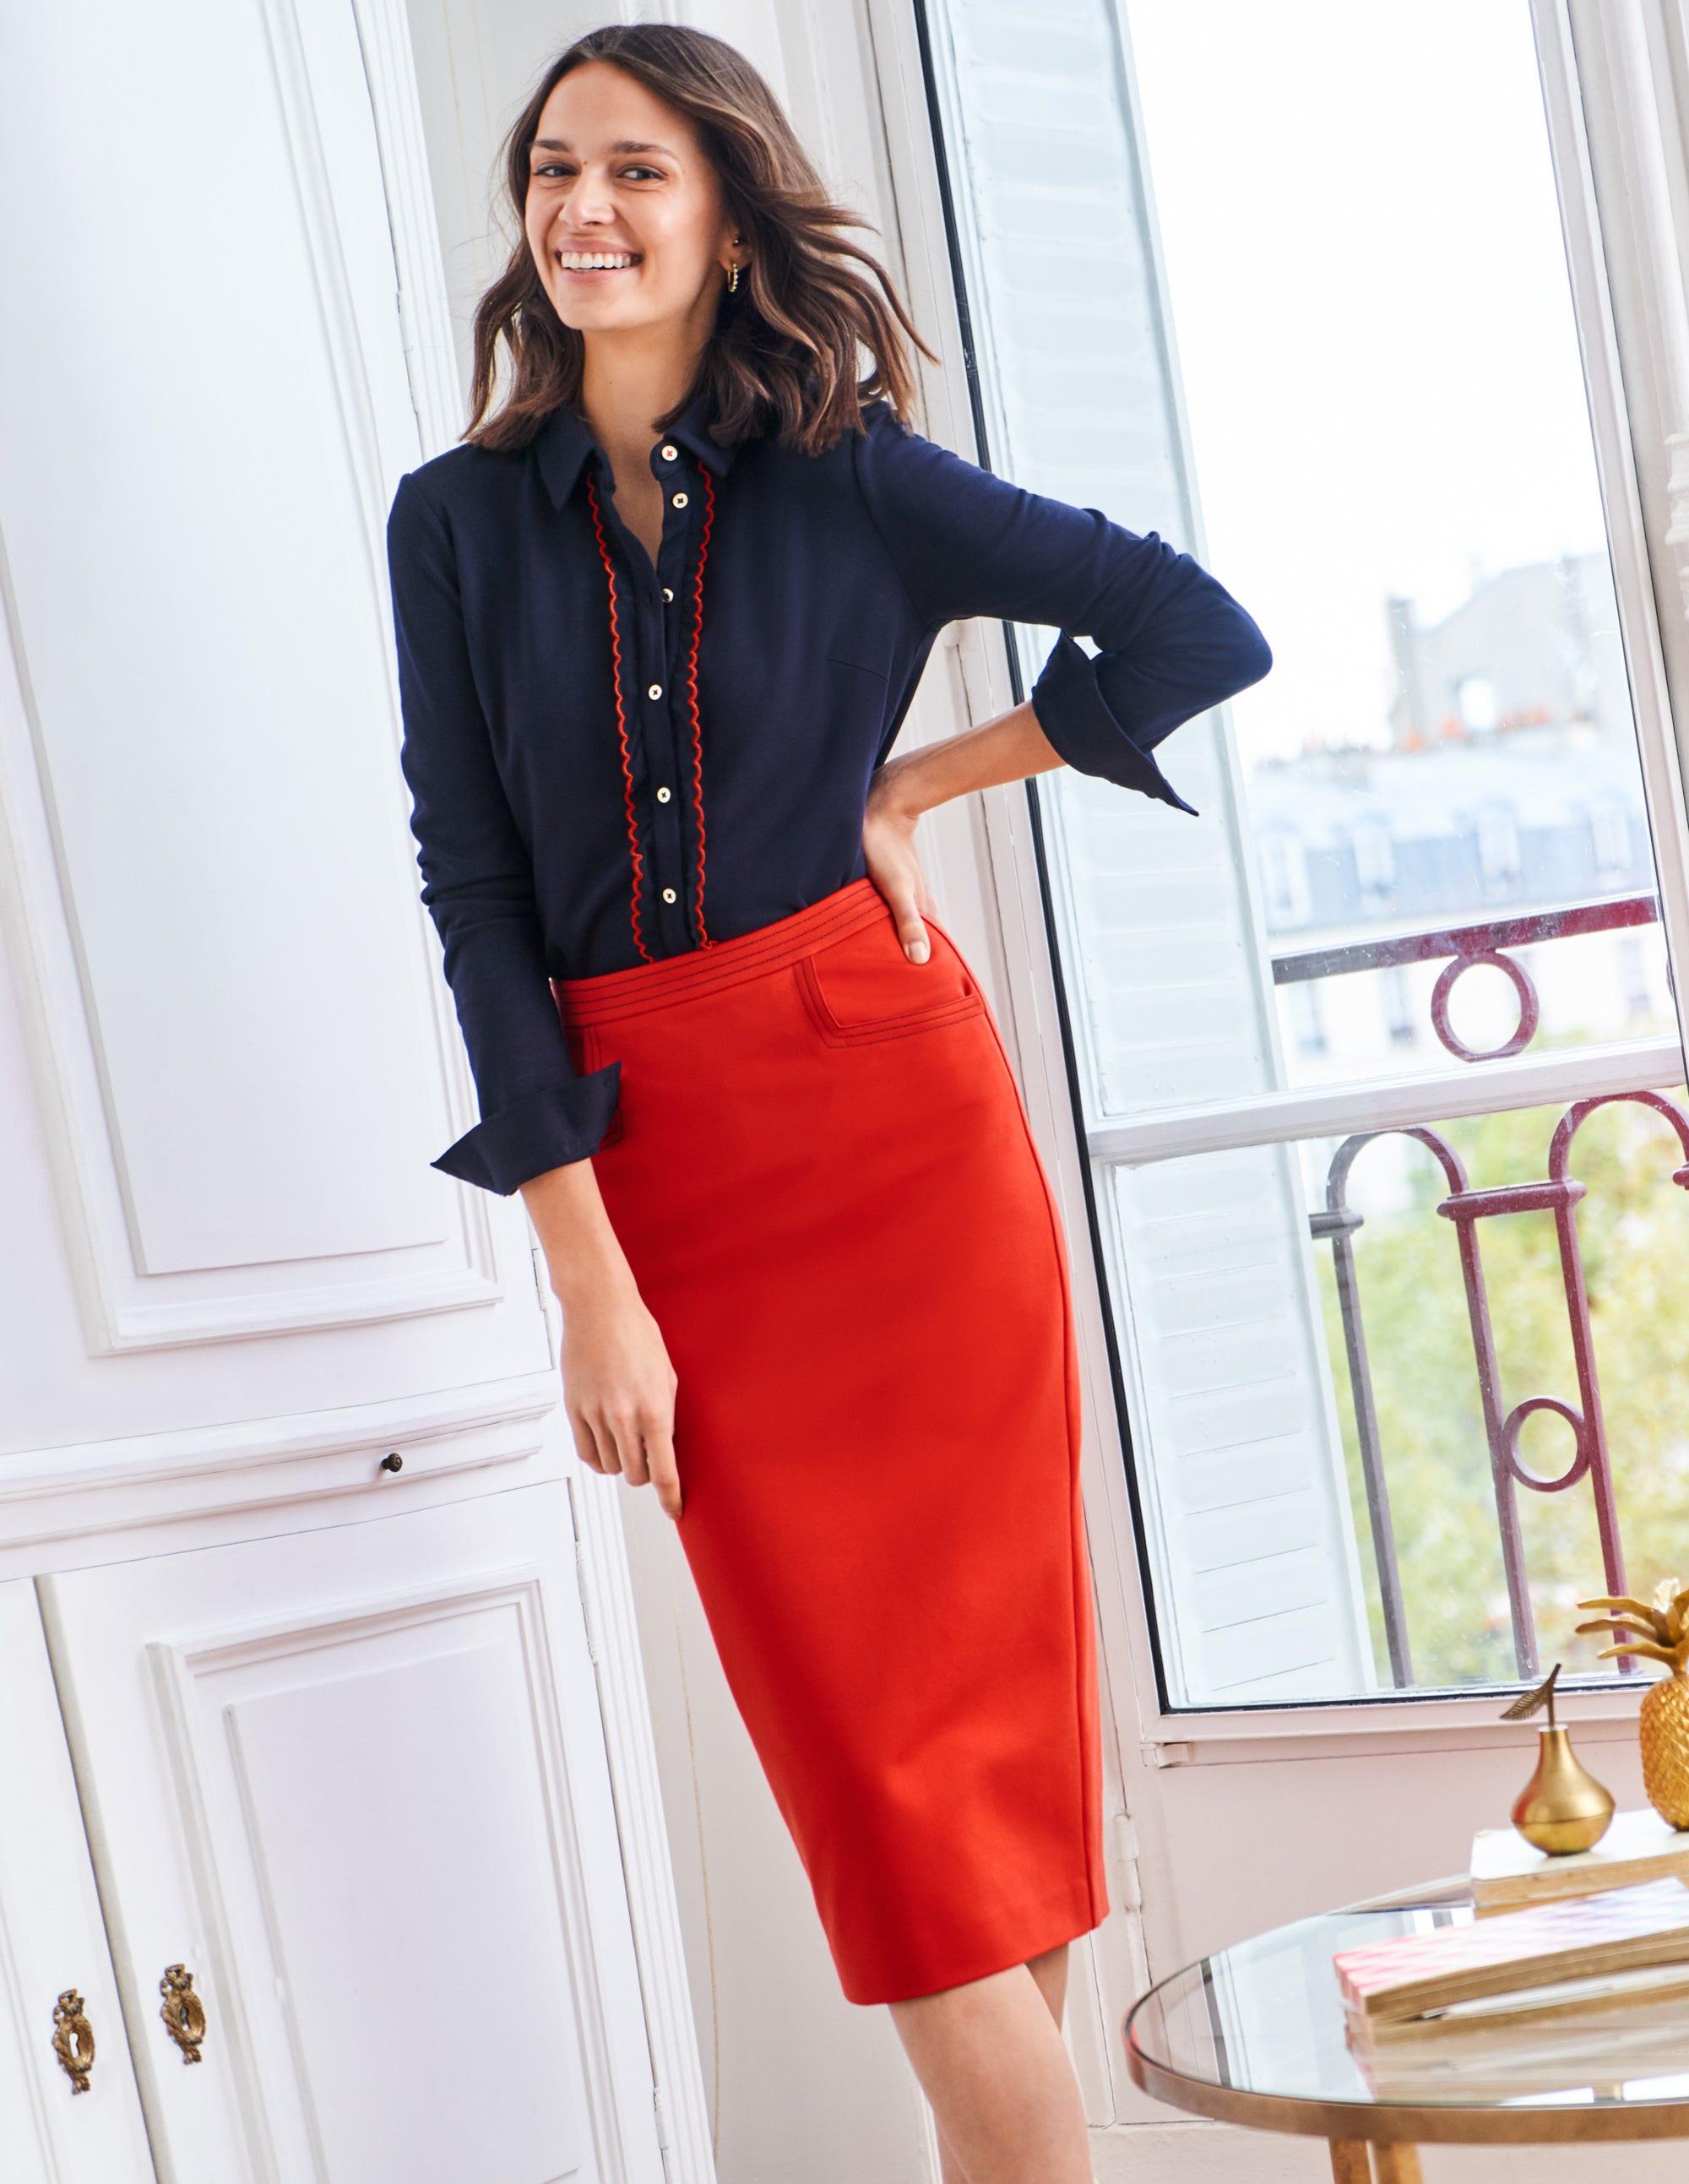 Boden Sedley Topstitch Pencil Skirt - Postbox Red/Navy